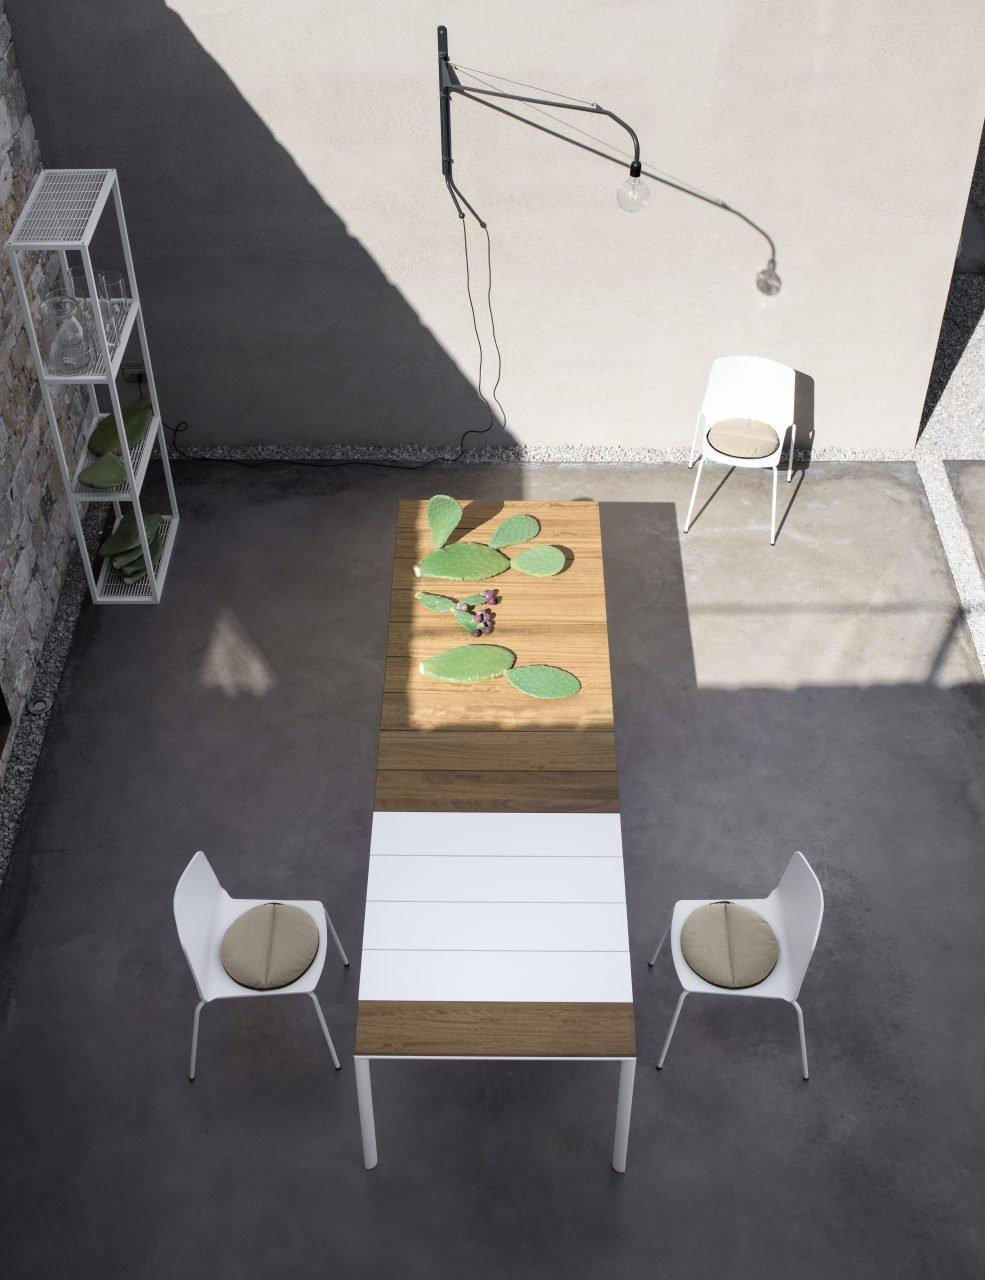 Maki Slated Table dining from Kristalia, designed by Bartoli Design